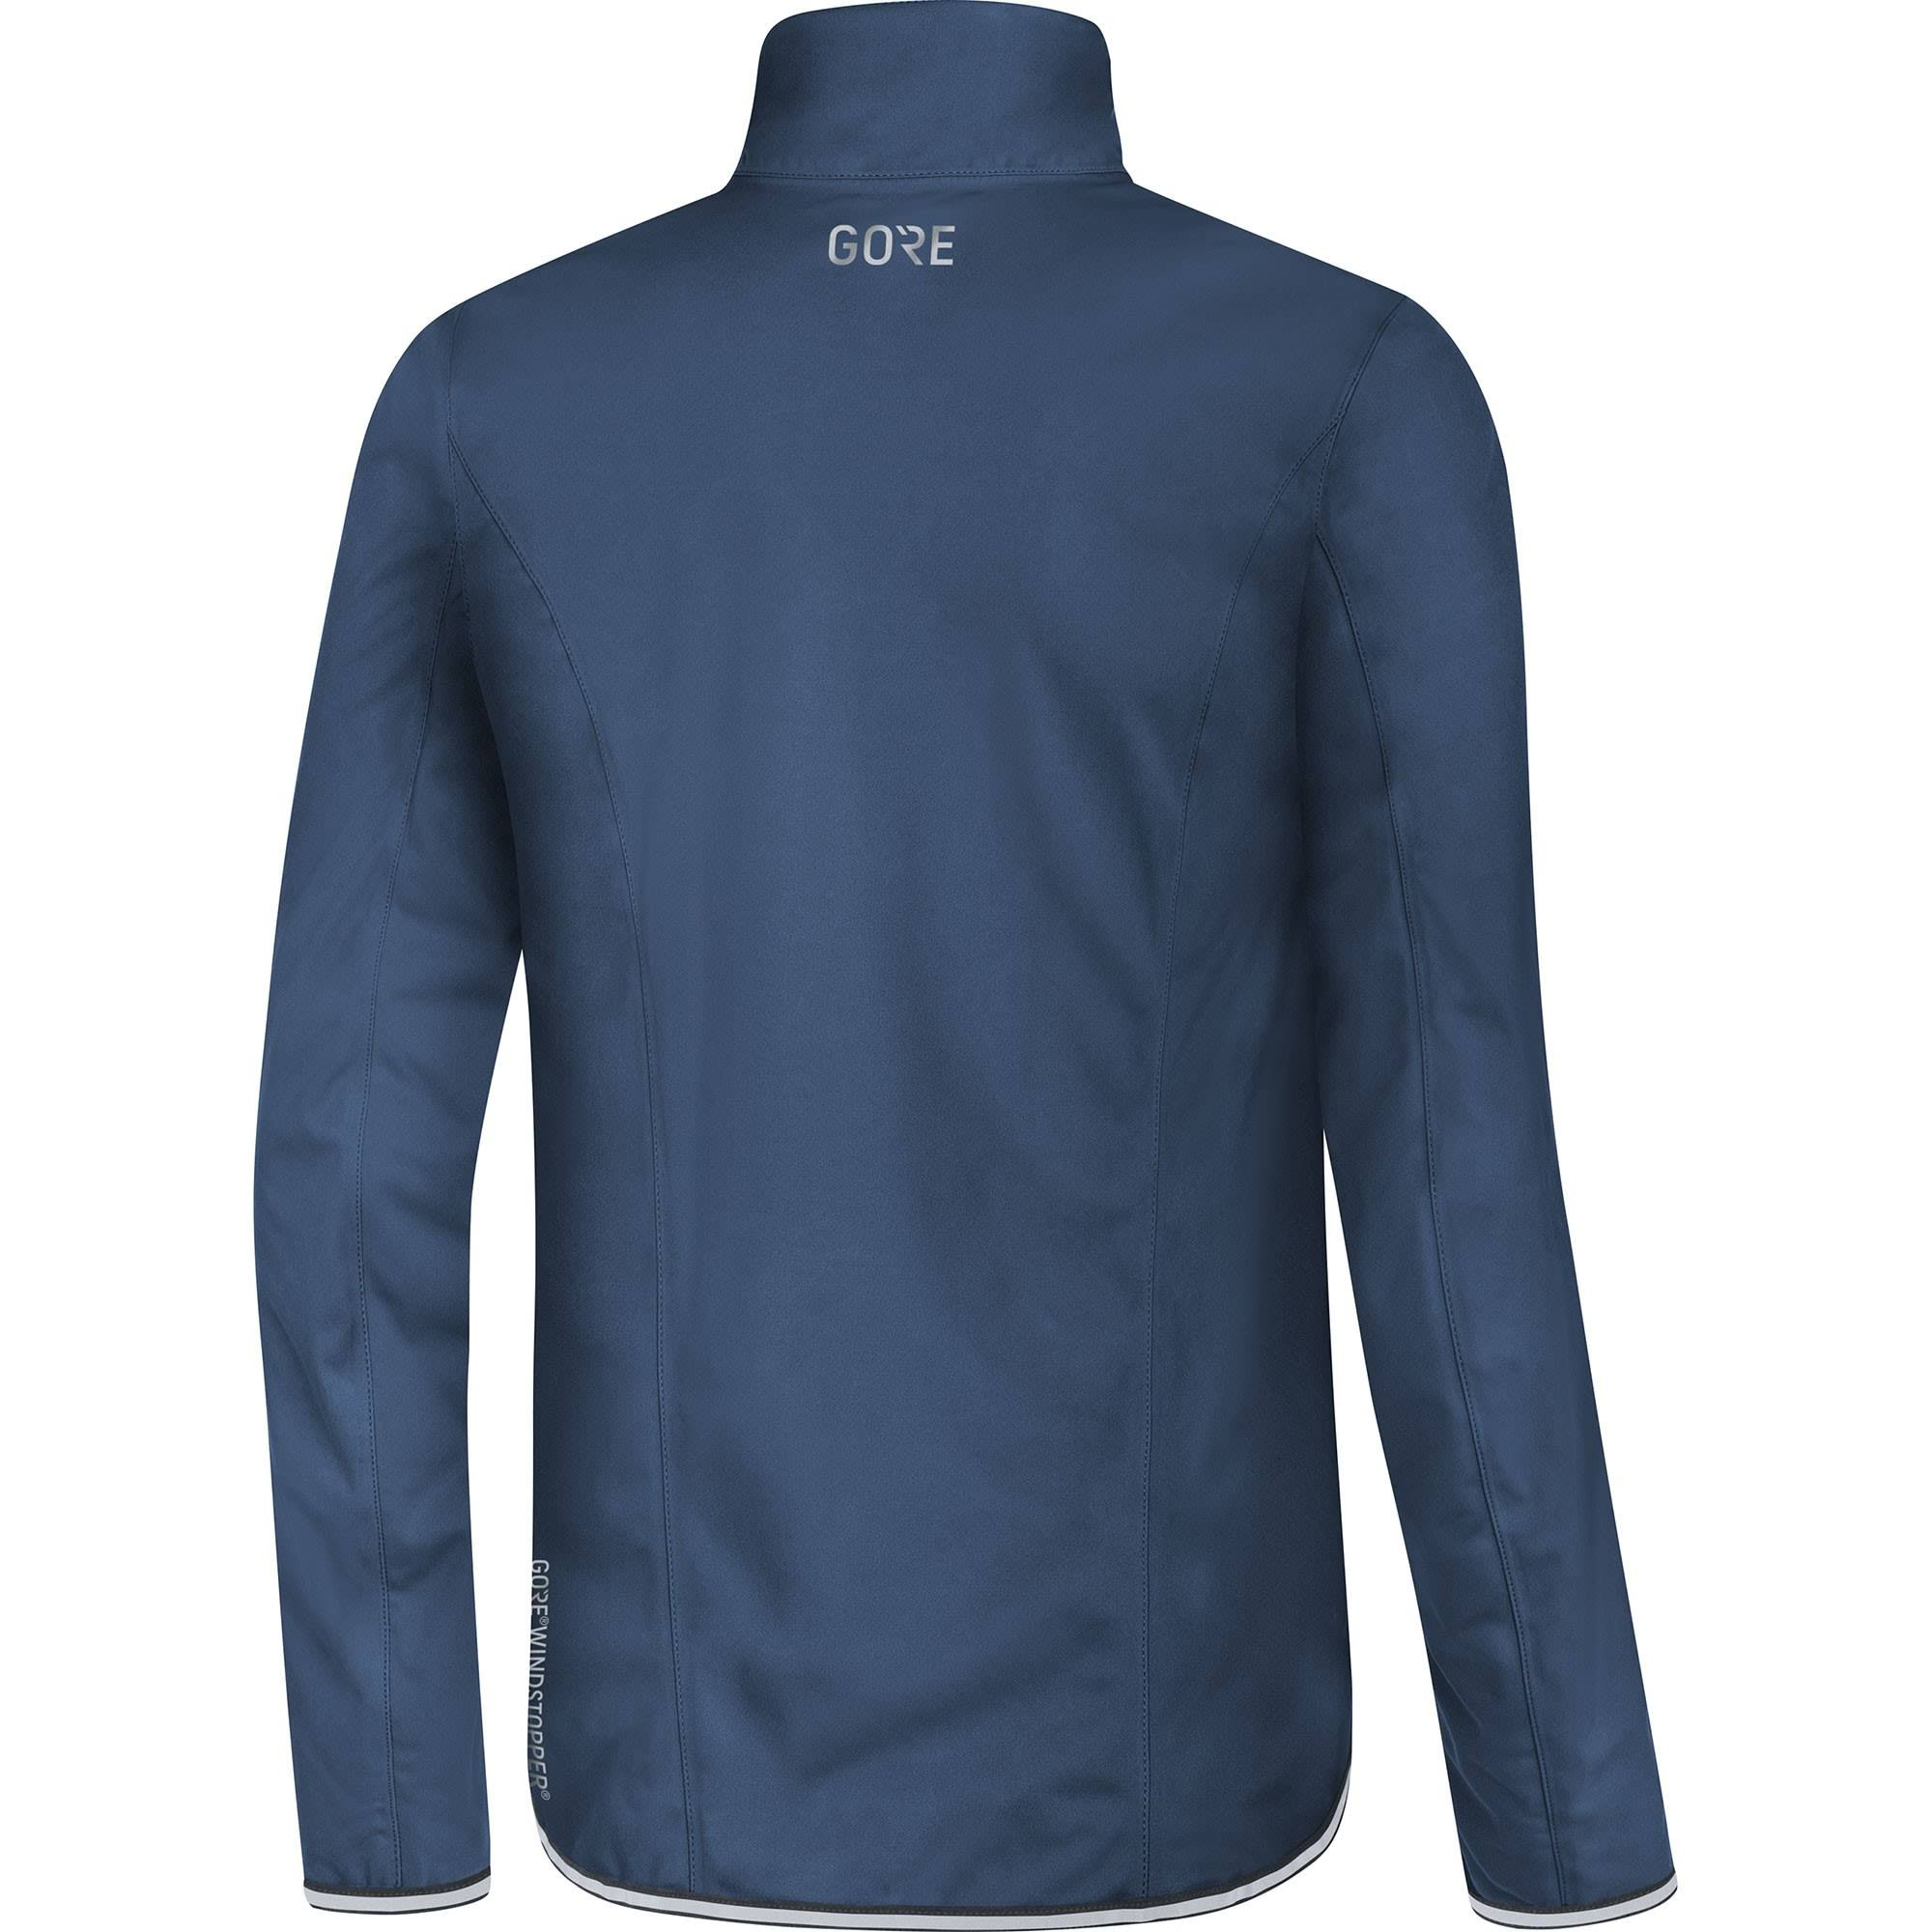 Wear R3 Chaqueta Windstopper Gore Deep S Azul Marino 4fxw5